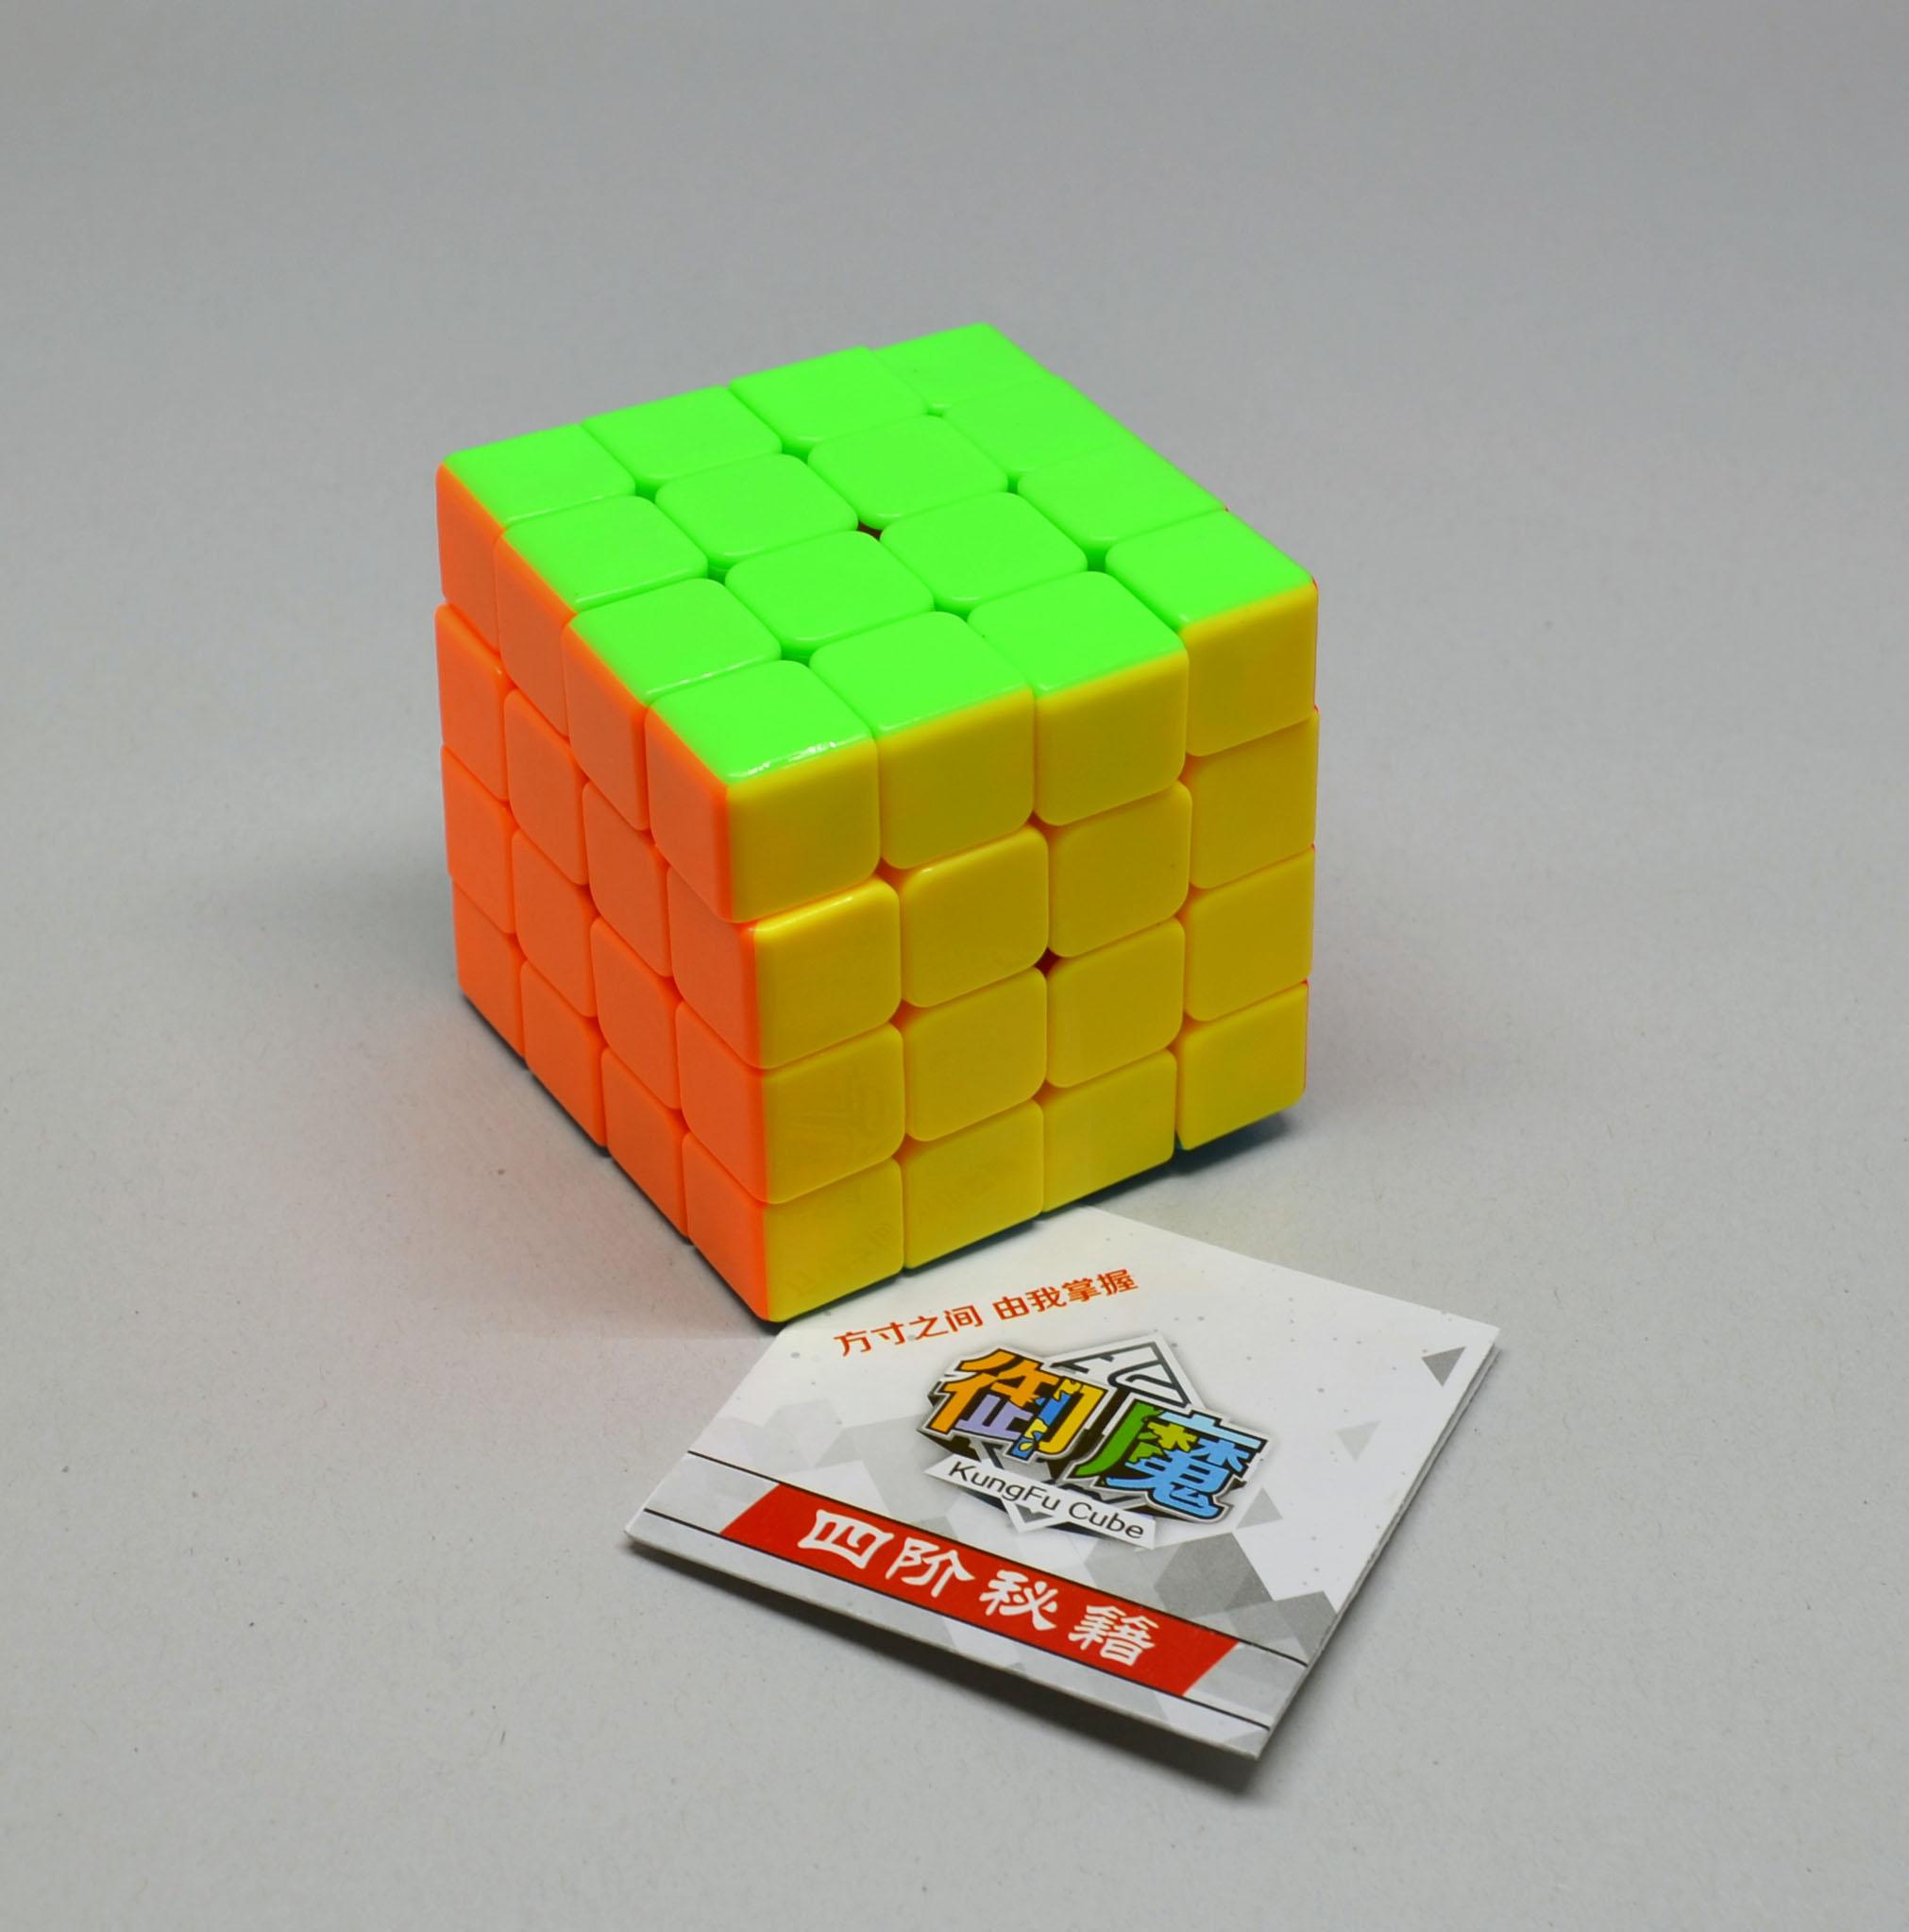 The 4x4x4.